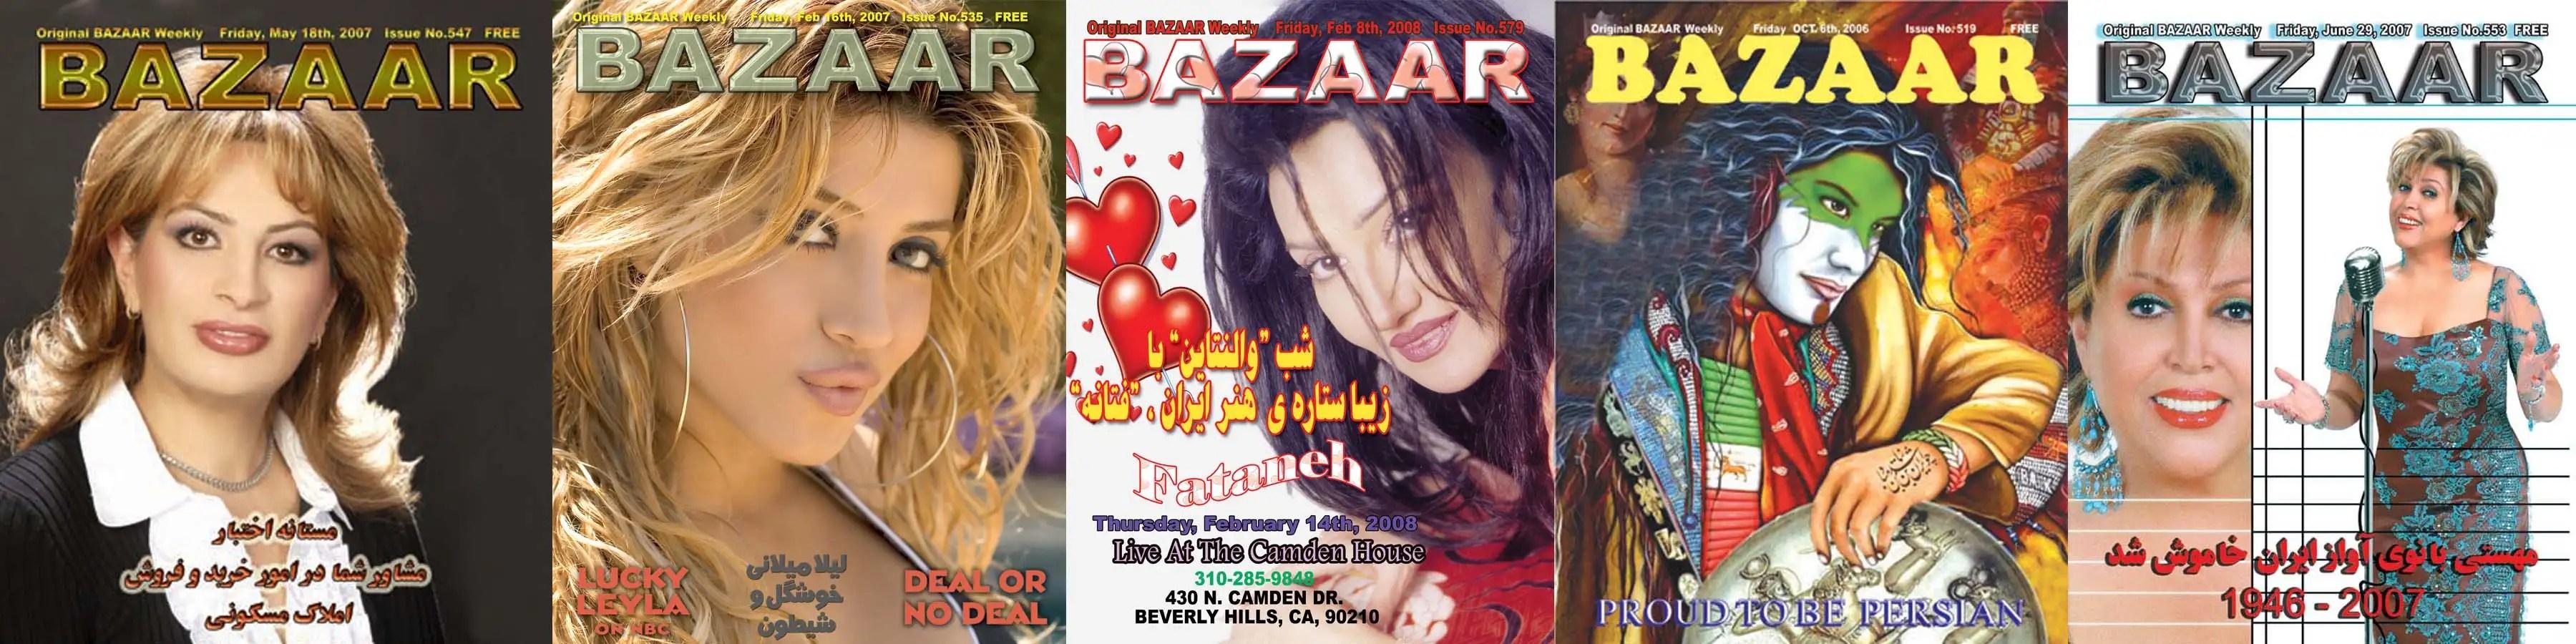 BAZAAR weekly-shahbod-noori